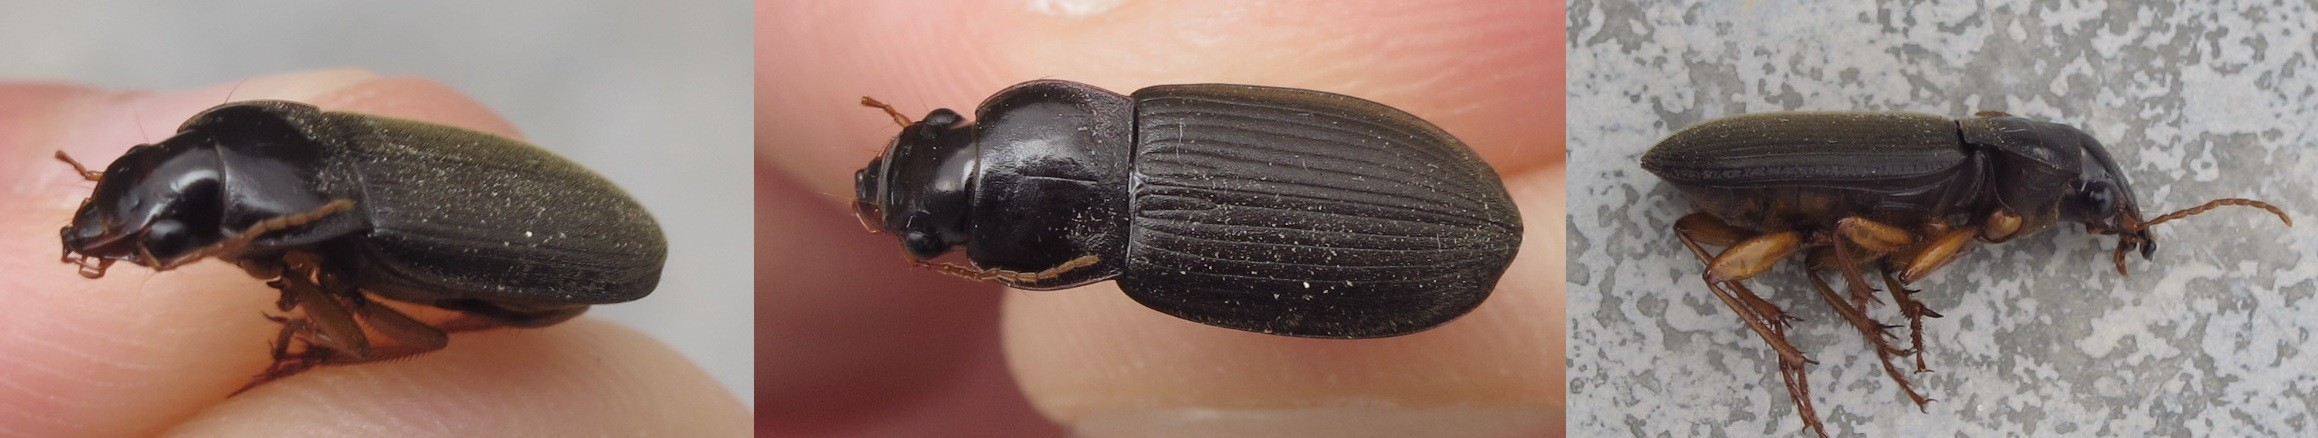 Invasion scarabée brun noir Pseudo12